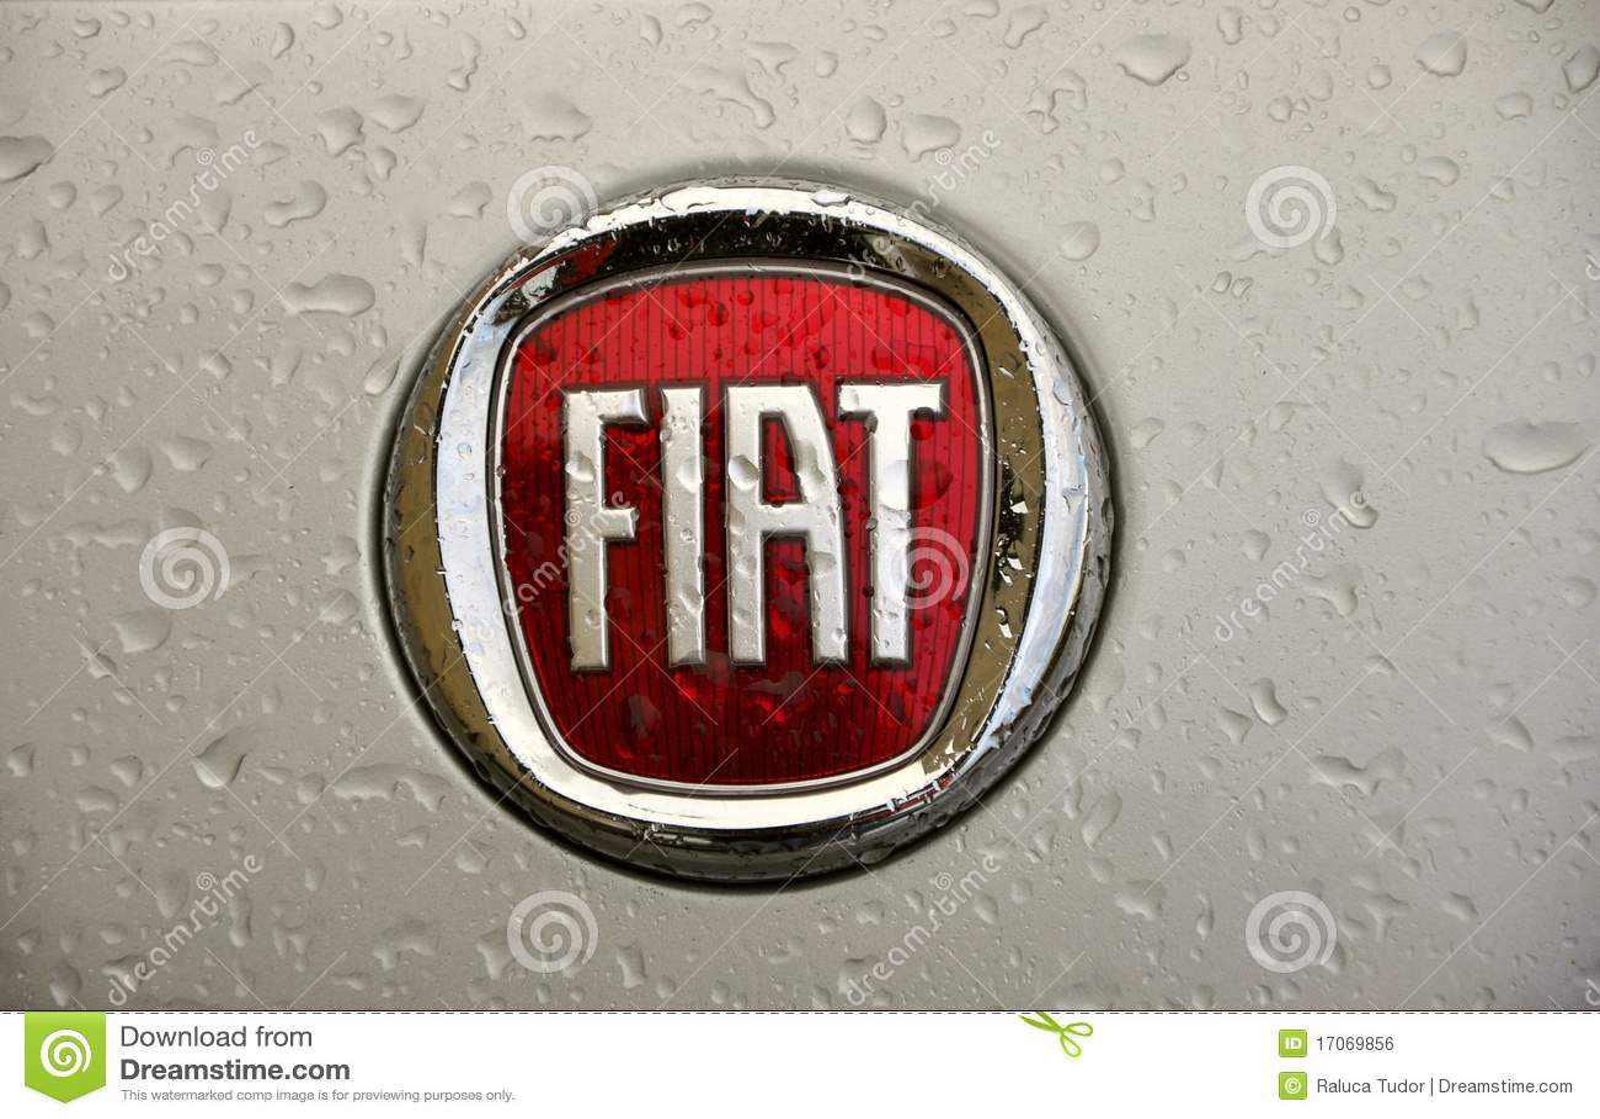 Fiat Logo Editorial Photo Image Of Company International 17069856